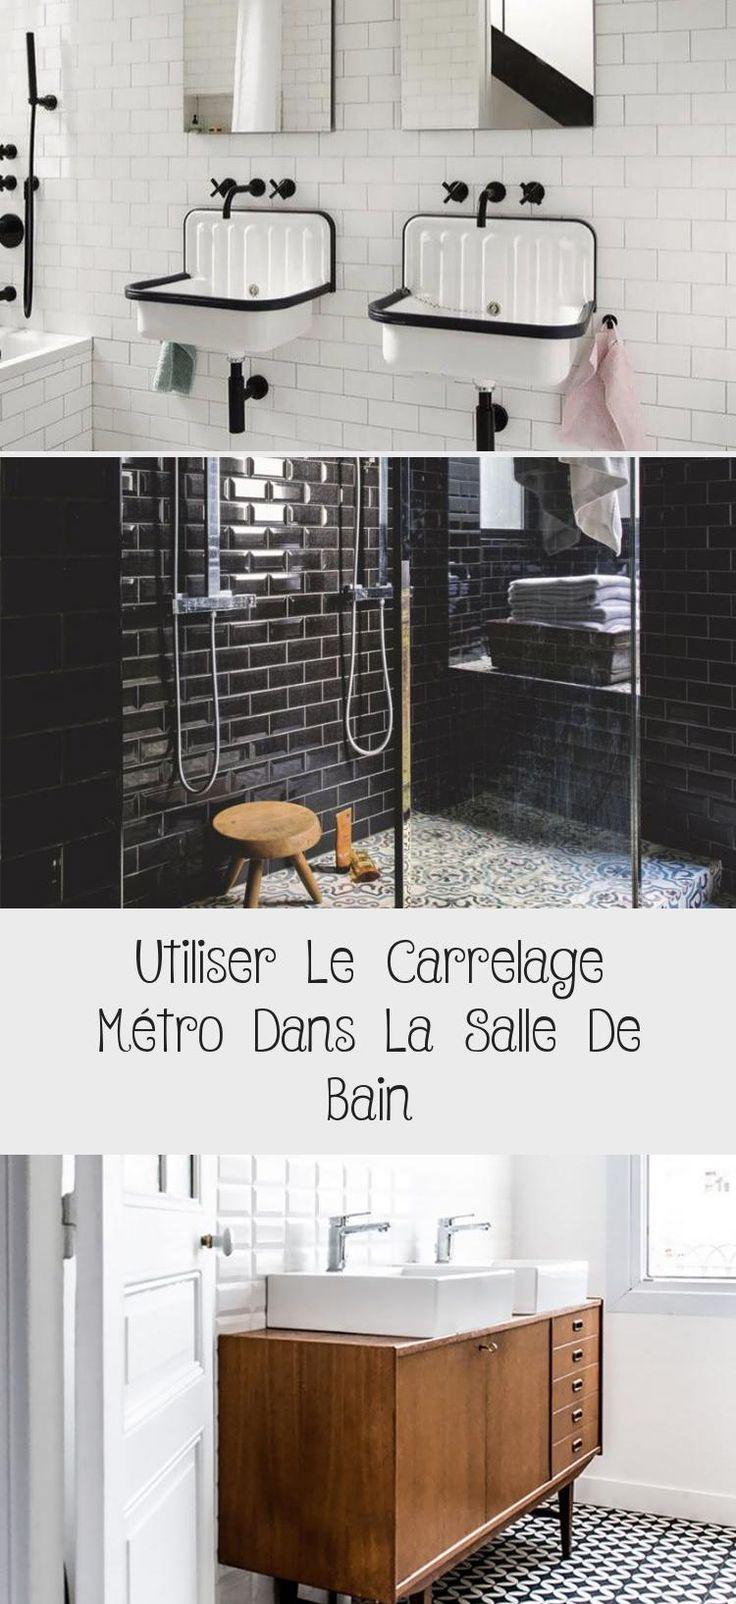 Utiliser Le Carrelage Metro Dans La Salle De Bain Modern